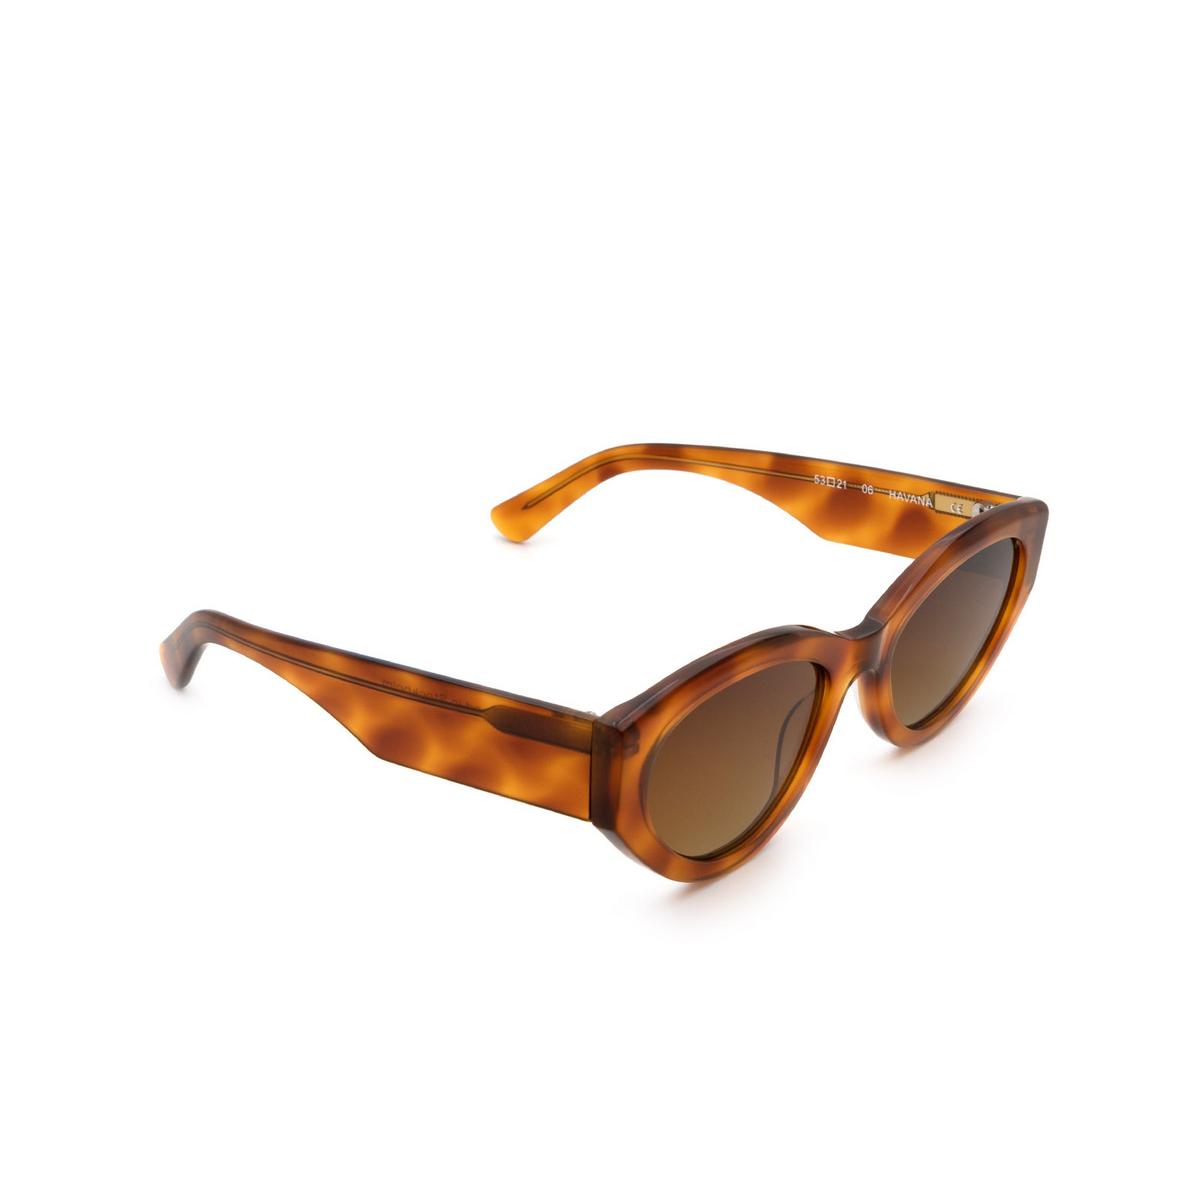 Chimi® Cat-eye Sunglasses: 06 color Havana - three-quarters view.